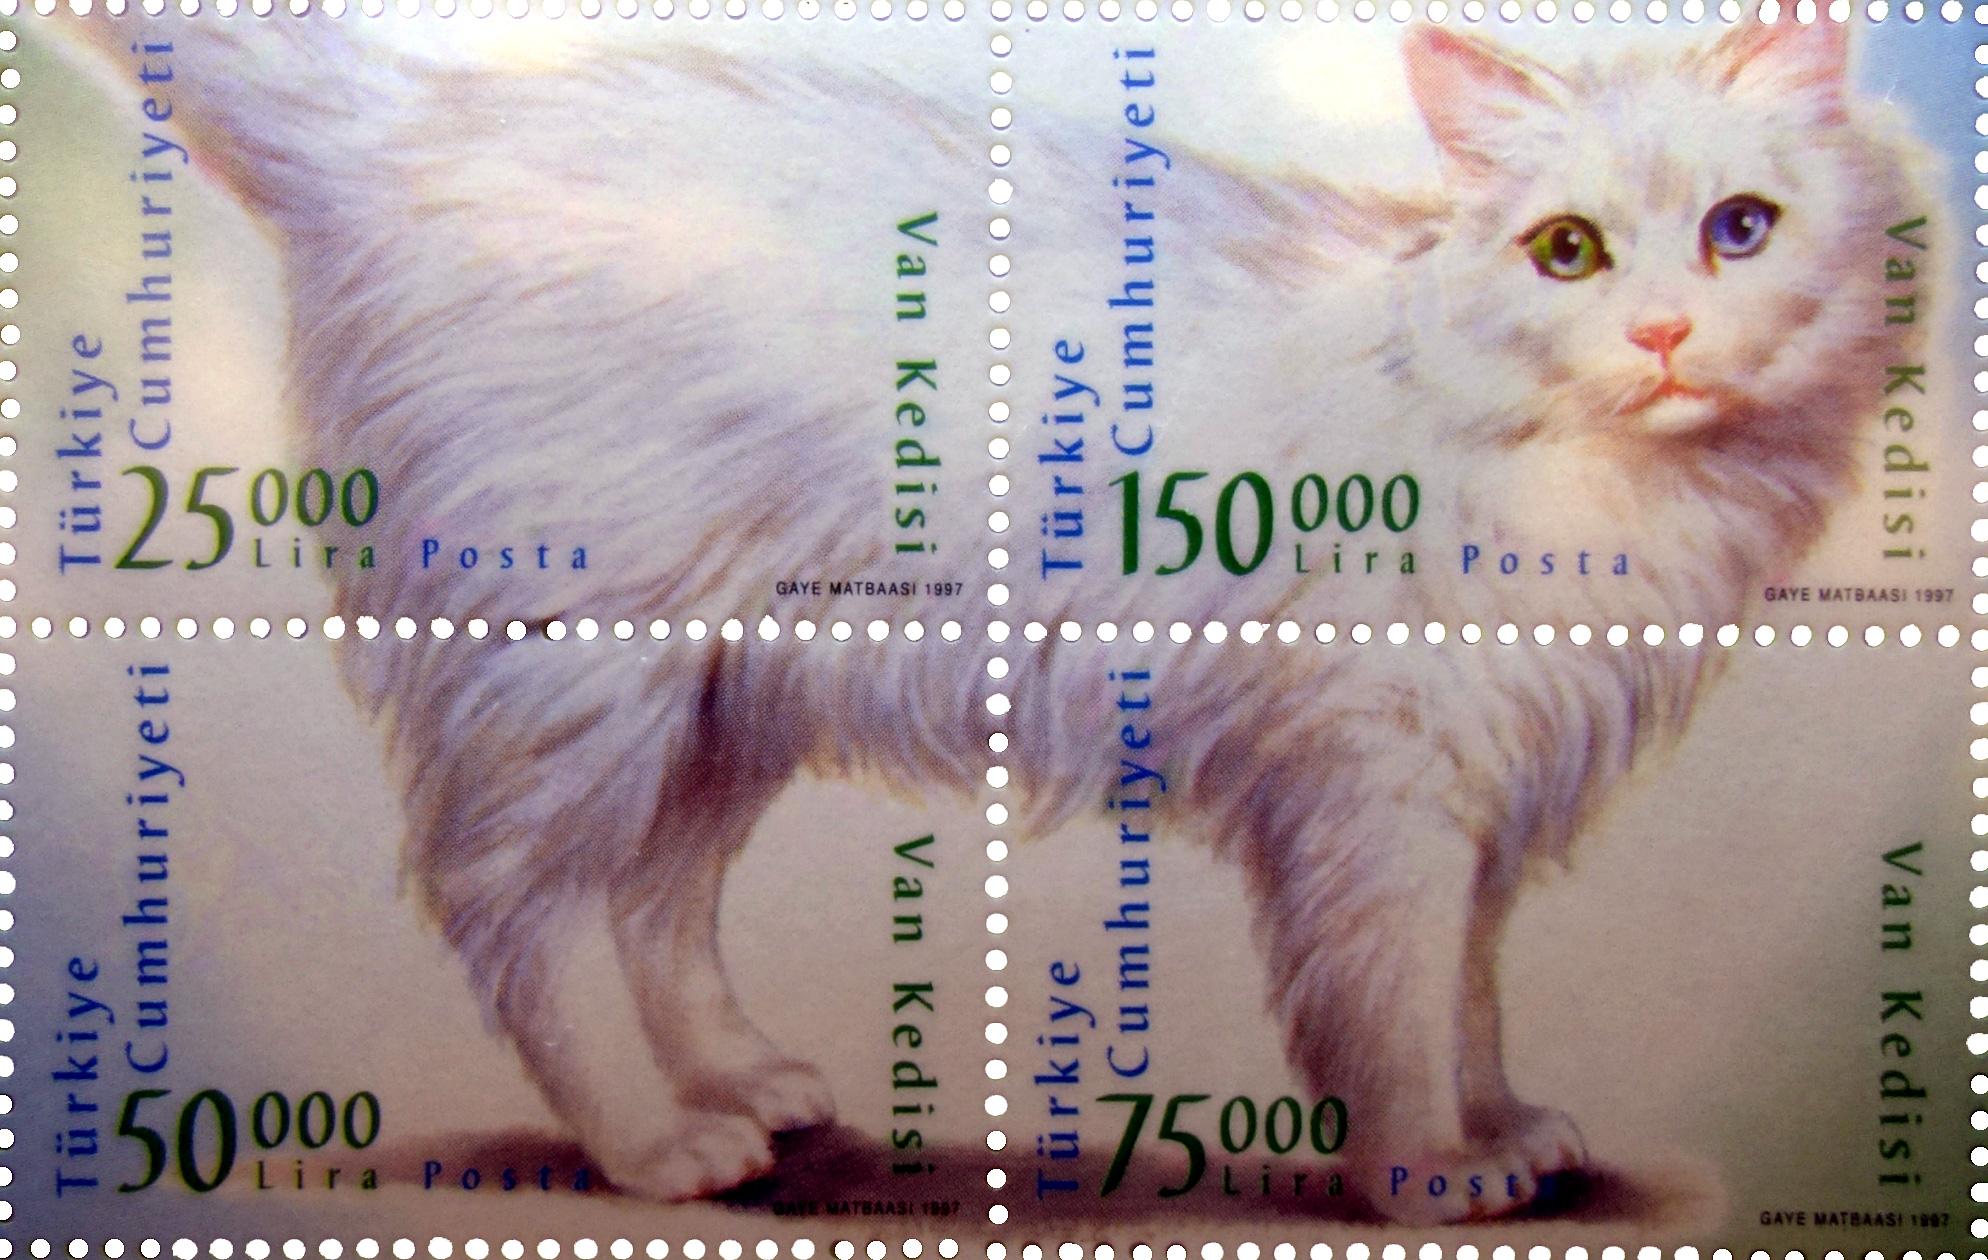 Unbezahlbar: Van-Katze, Van kedisi. Kopf 150.000 TL (Briefmarken, 1997)